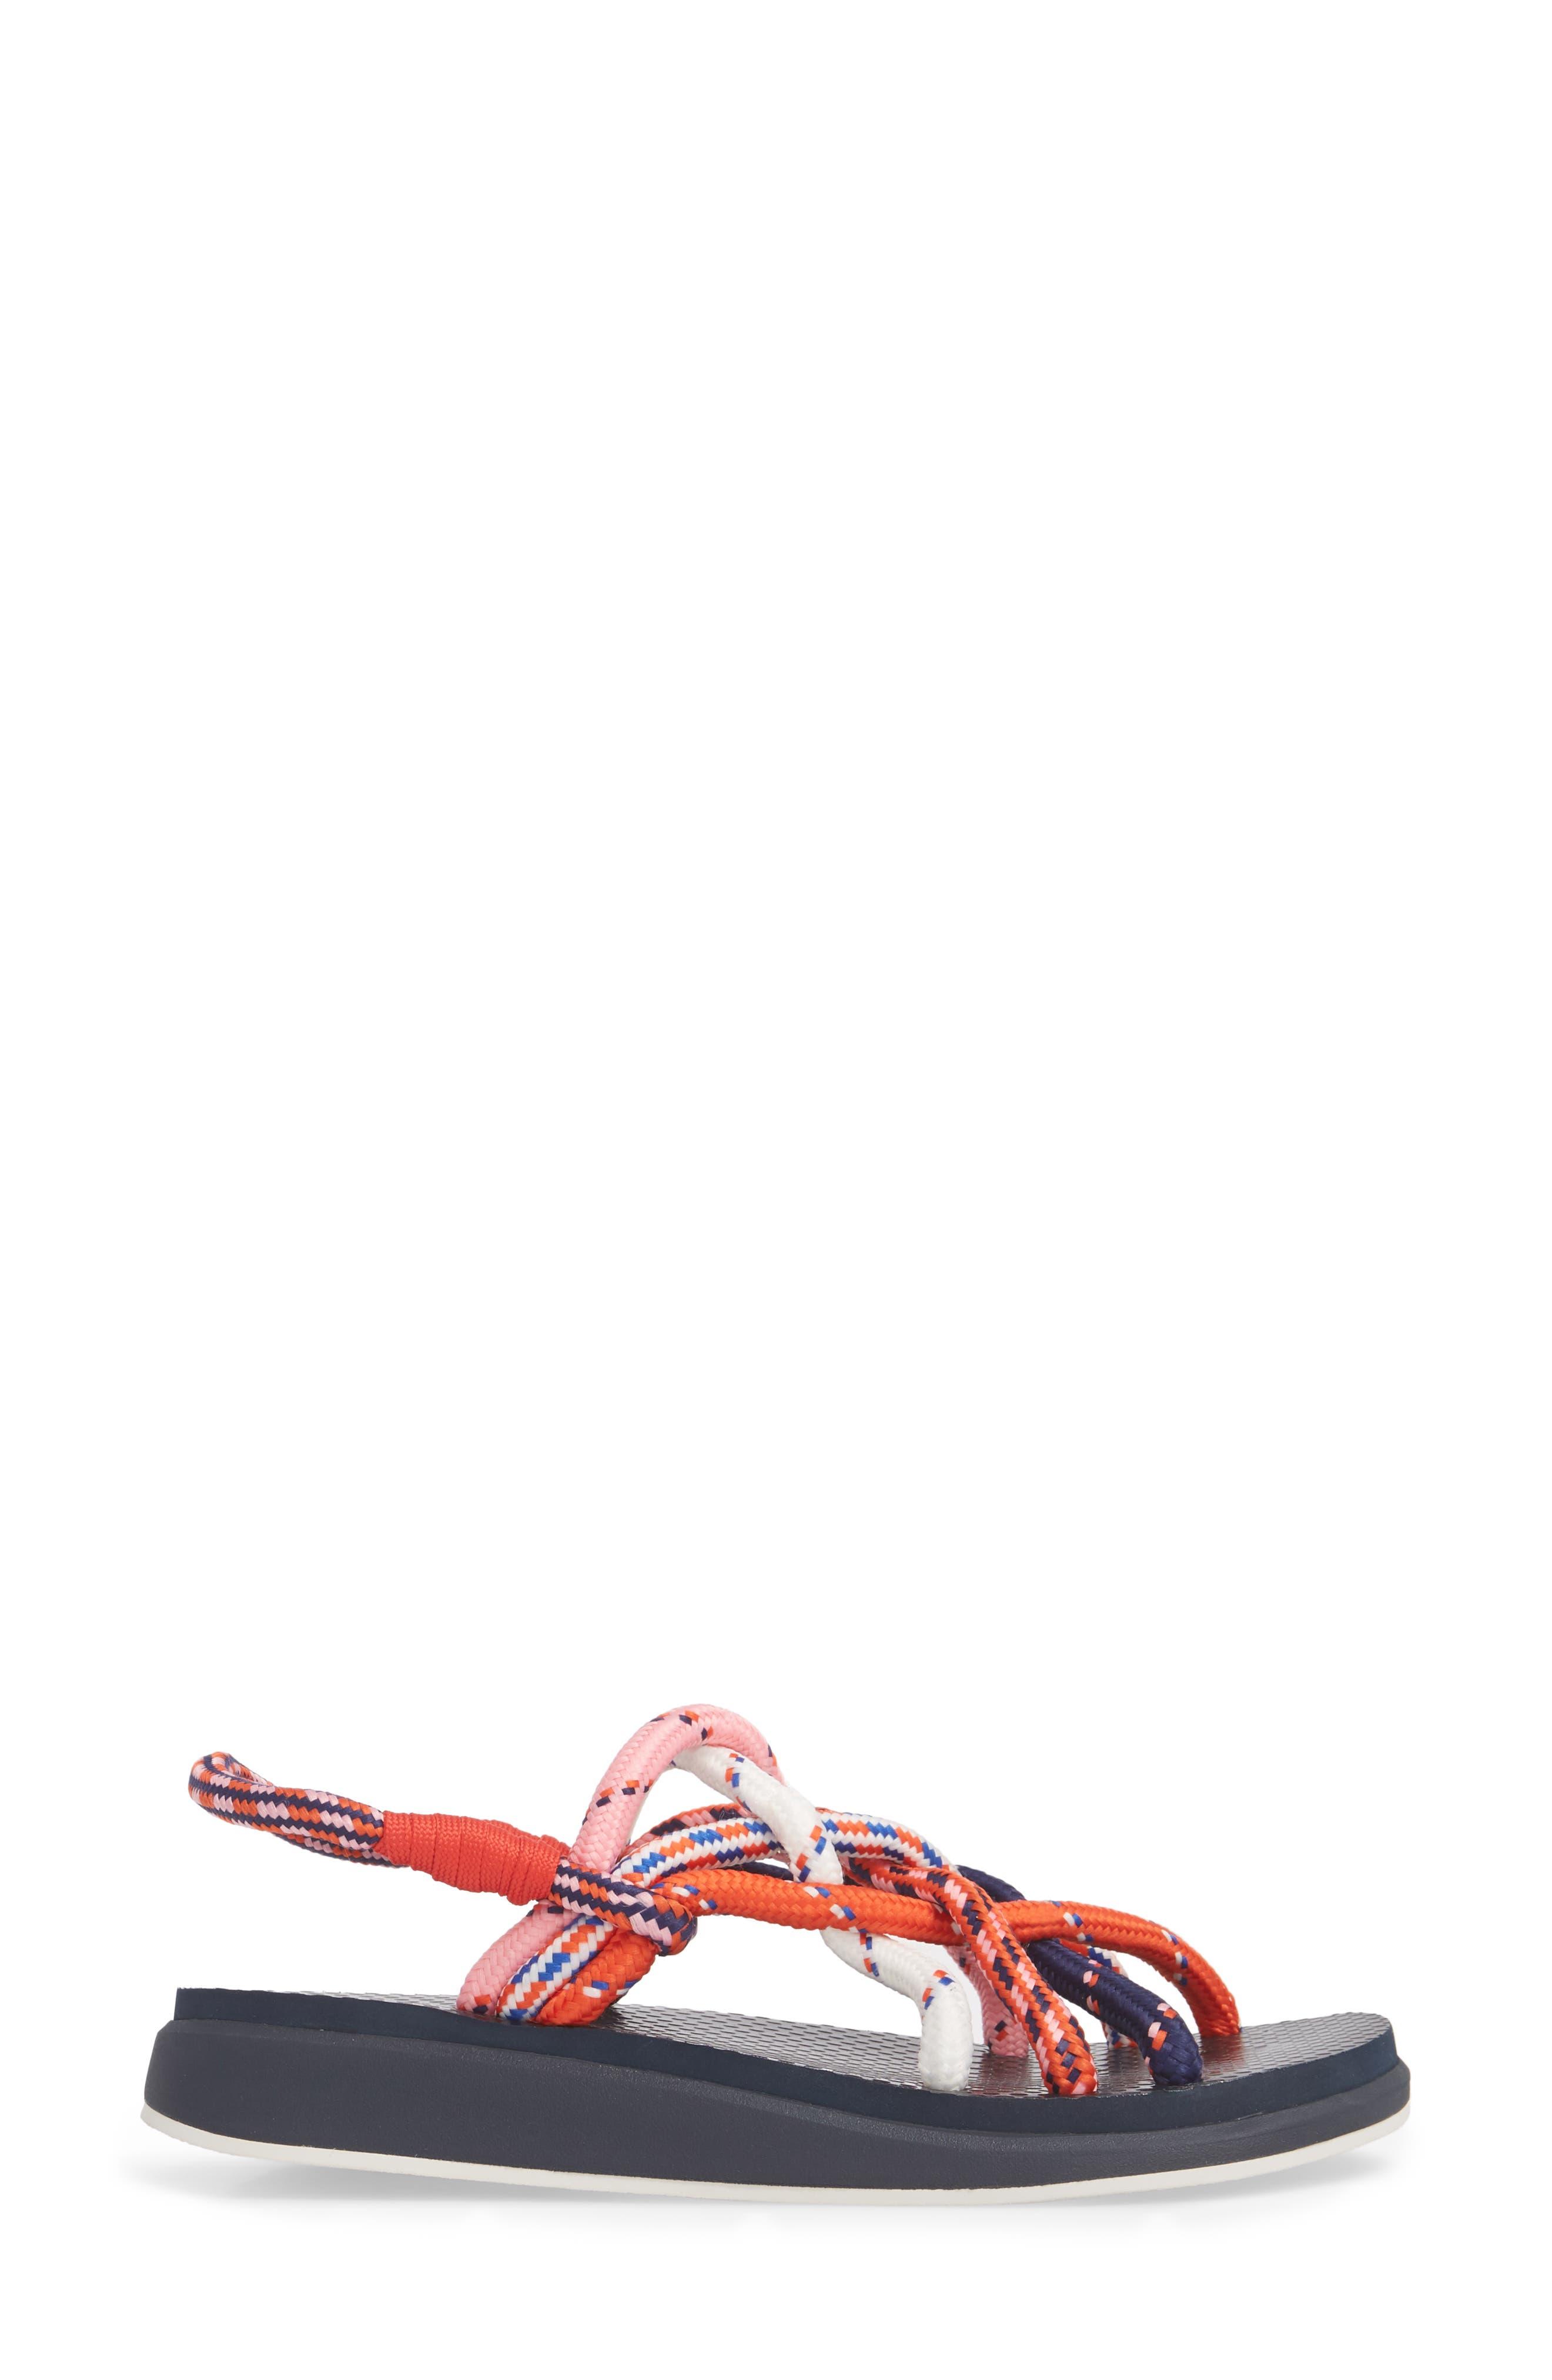 Rope Sandal,                             Alternate thumbnail 3, color,                             Red Multi